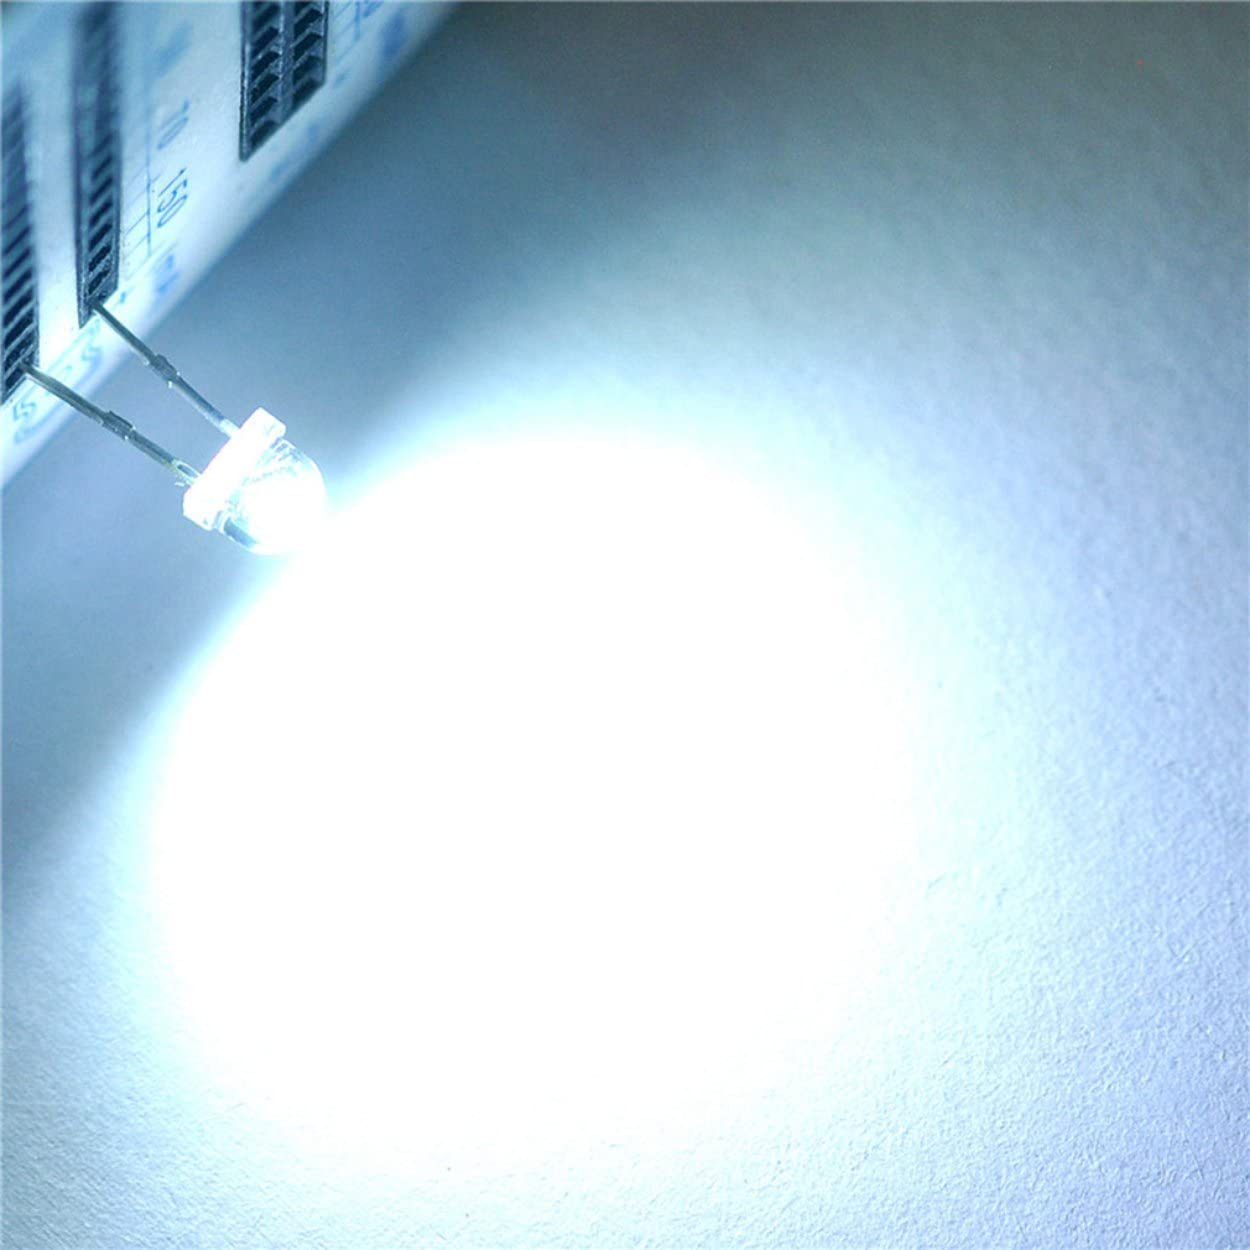 Lodenlli 100Pcs 5mm 2pin Redondo Blanco Ultra-Brillante L/ámpara de luz LED Diodos emisores L/ámpara de luz de Bombilla DIY 15000MCD